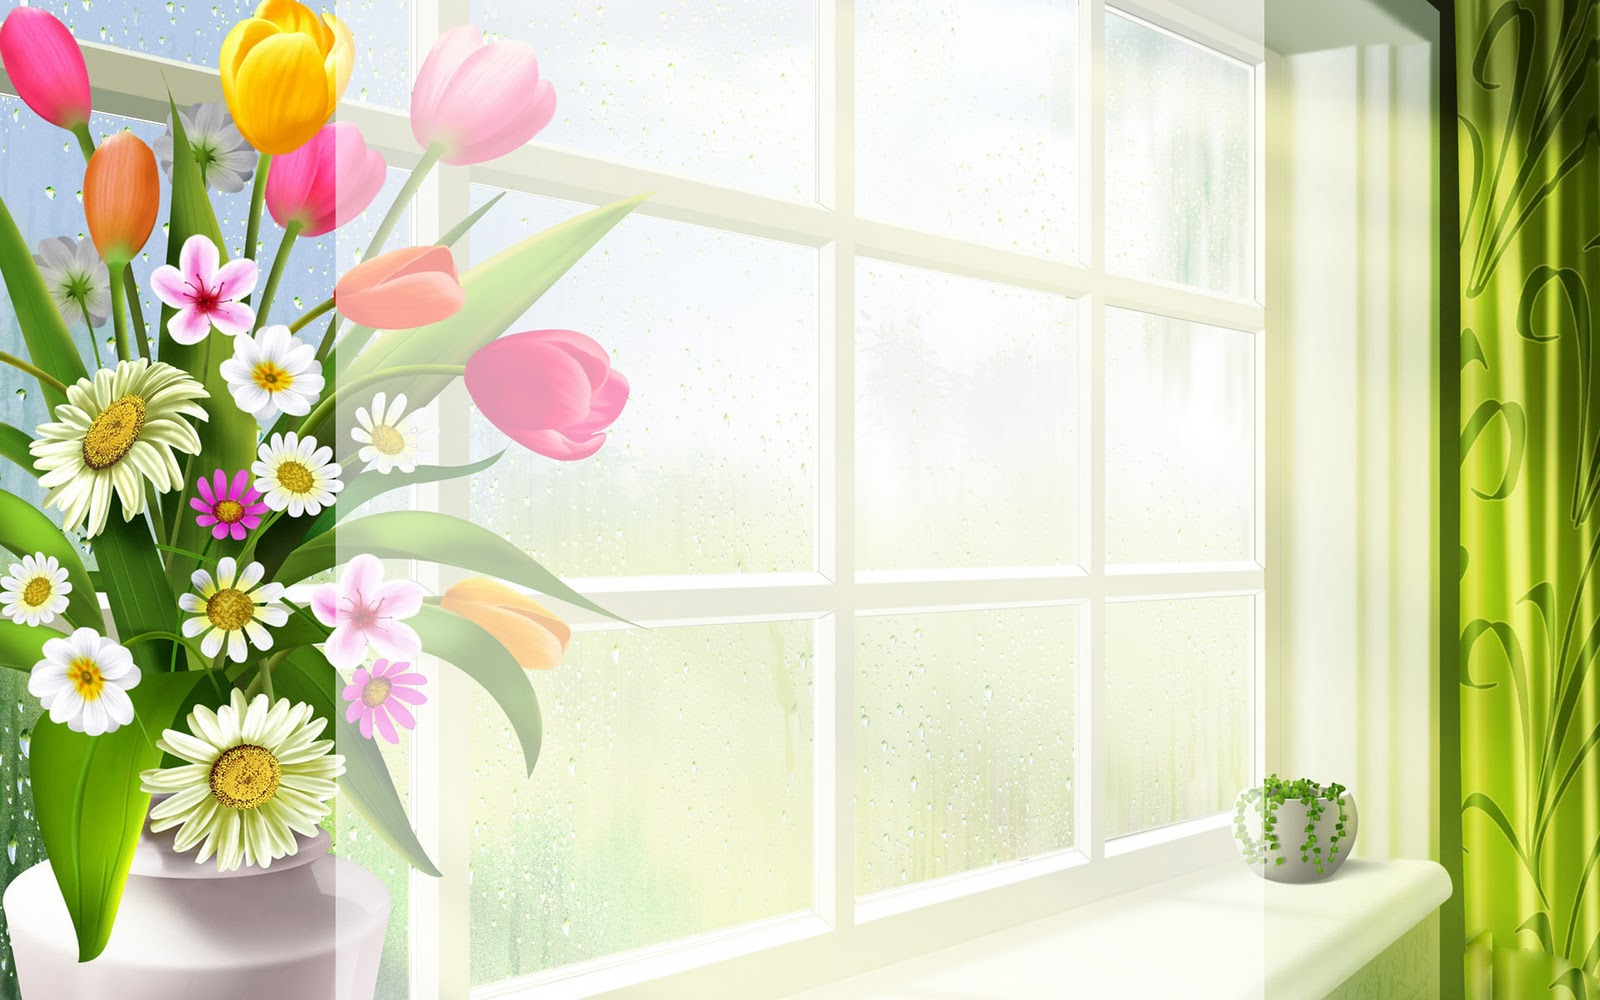 Download 46+ Background Putih Ceria Paling Keren - Download Background